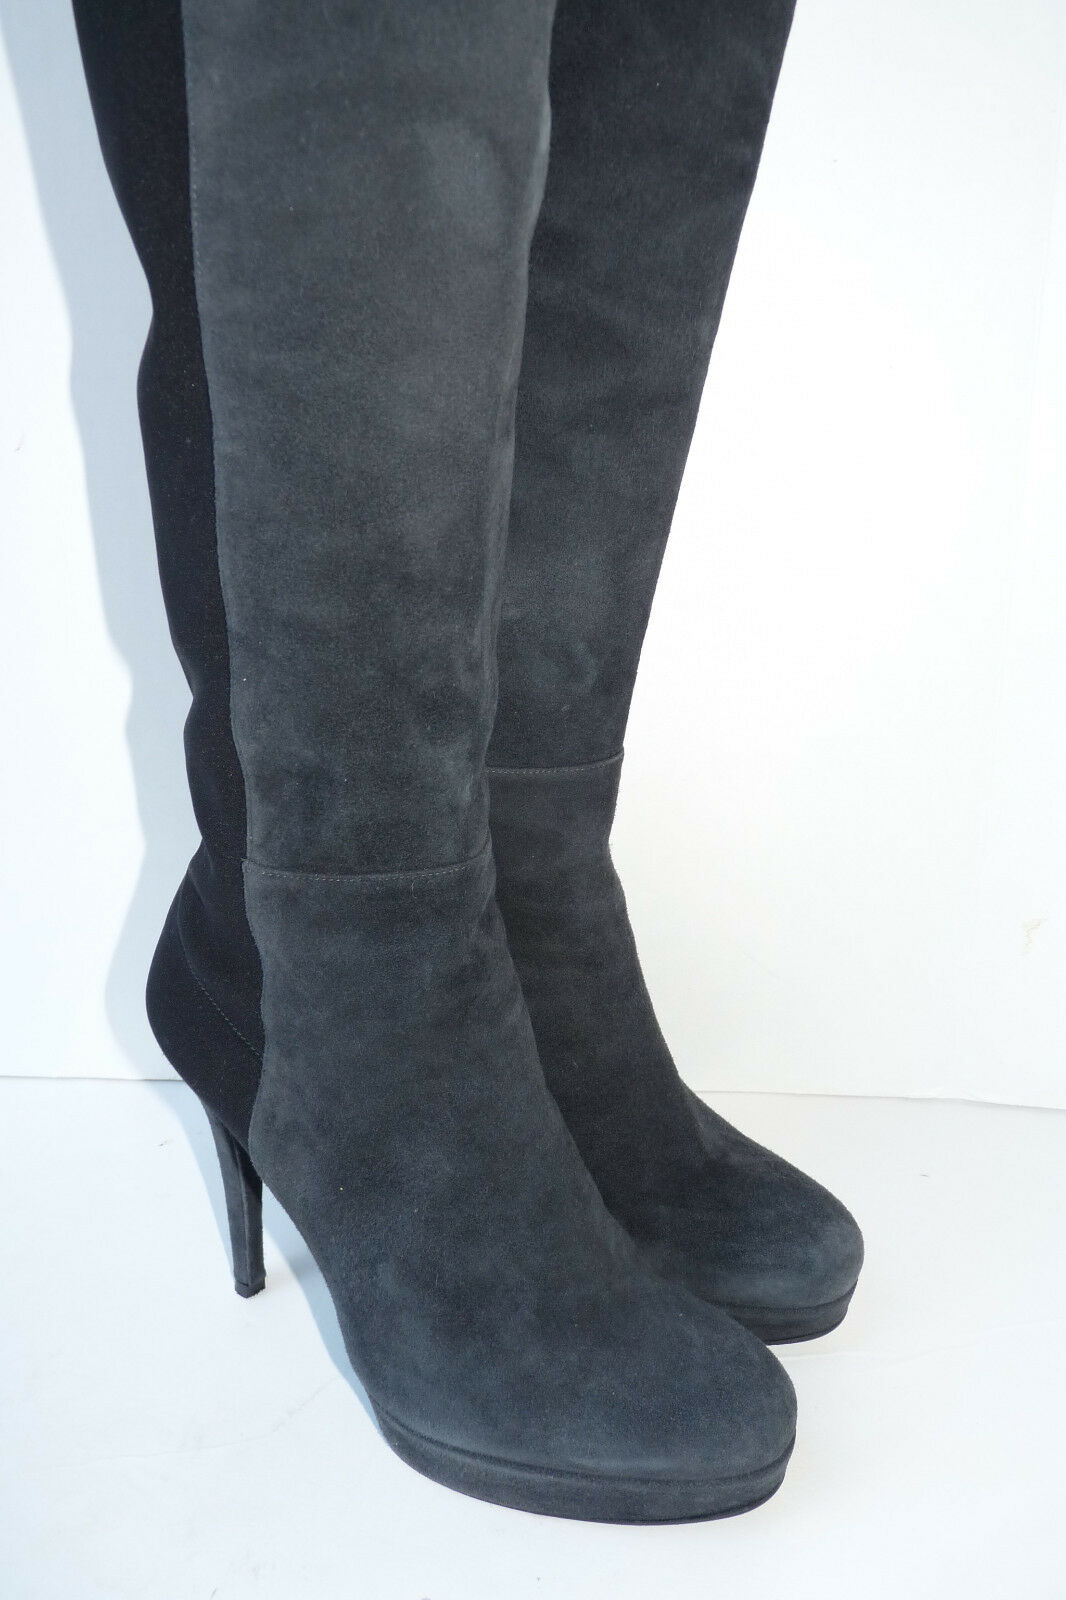 Stuart Weitzman Skyline Platform Grey Black Suede Women's Boots Size US 7.5